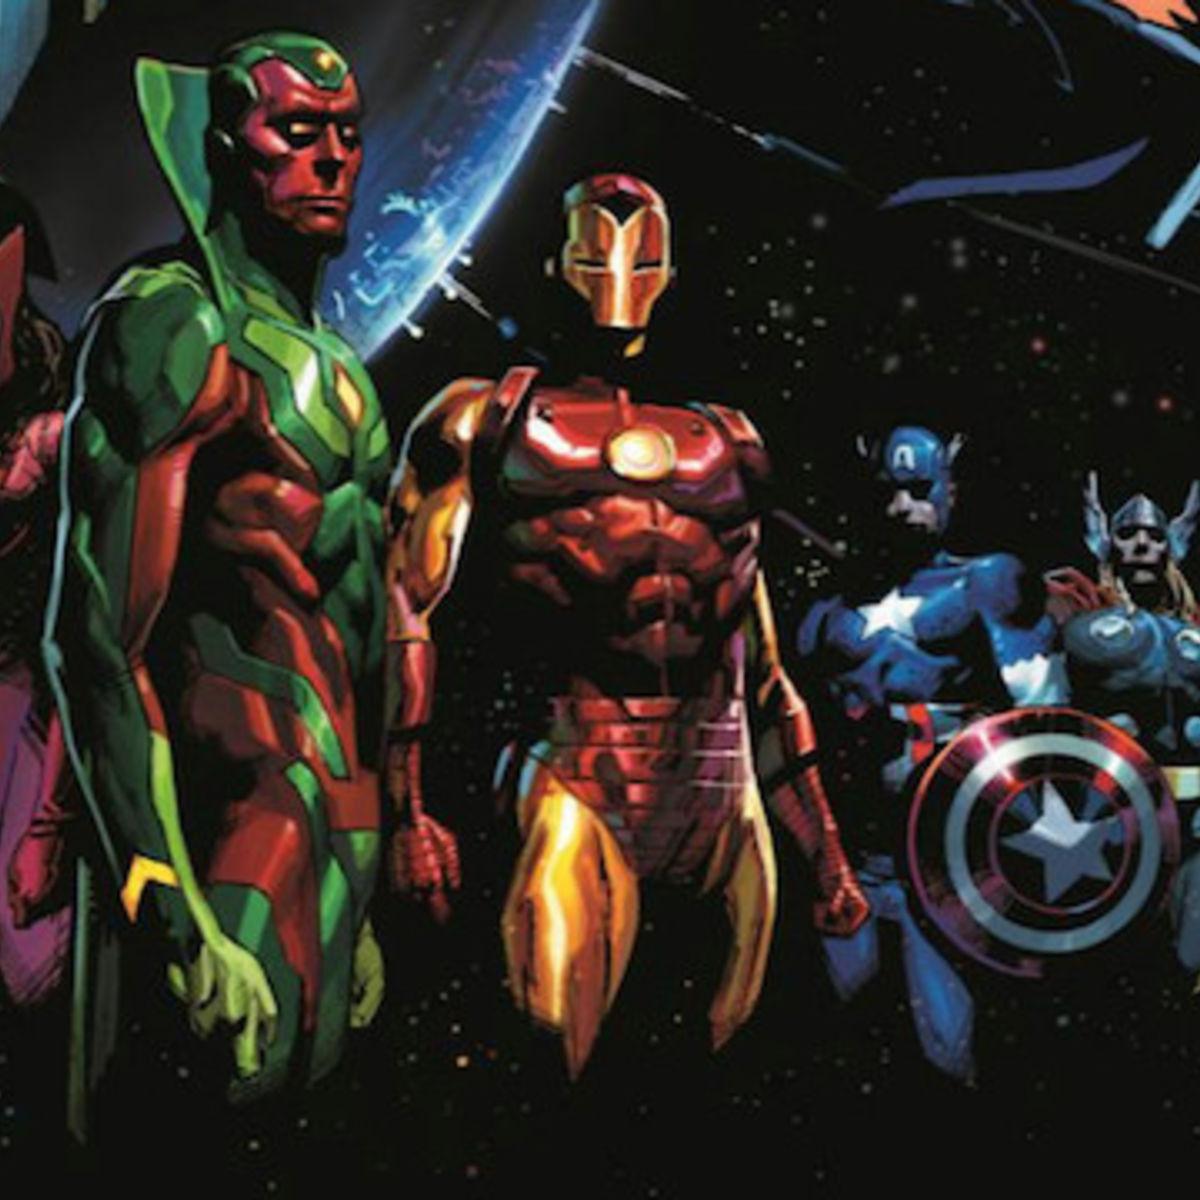 avengers-rage-of-ultron-e1427673967372-970x545.jpg